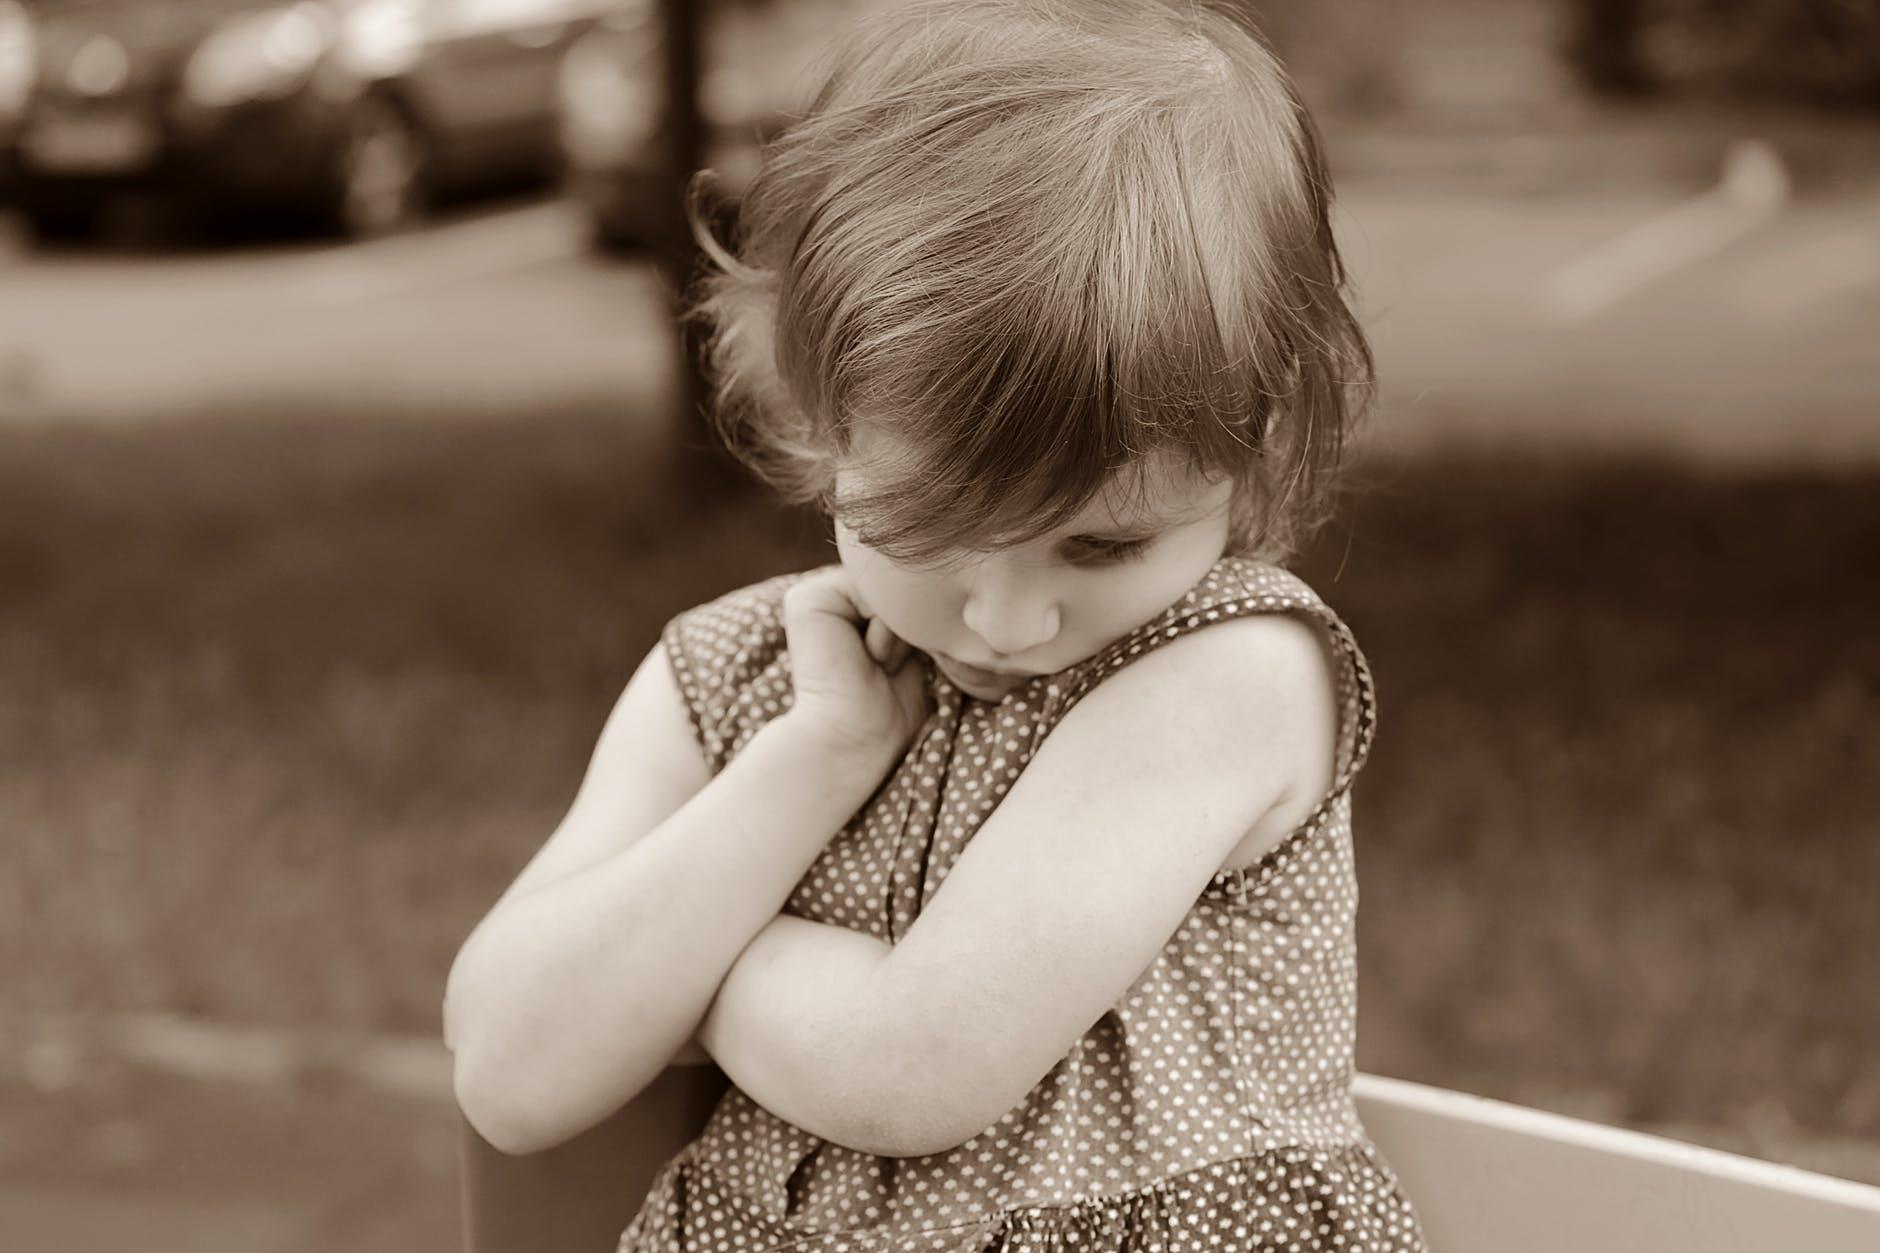 baby-girl-shy-emotions-160477